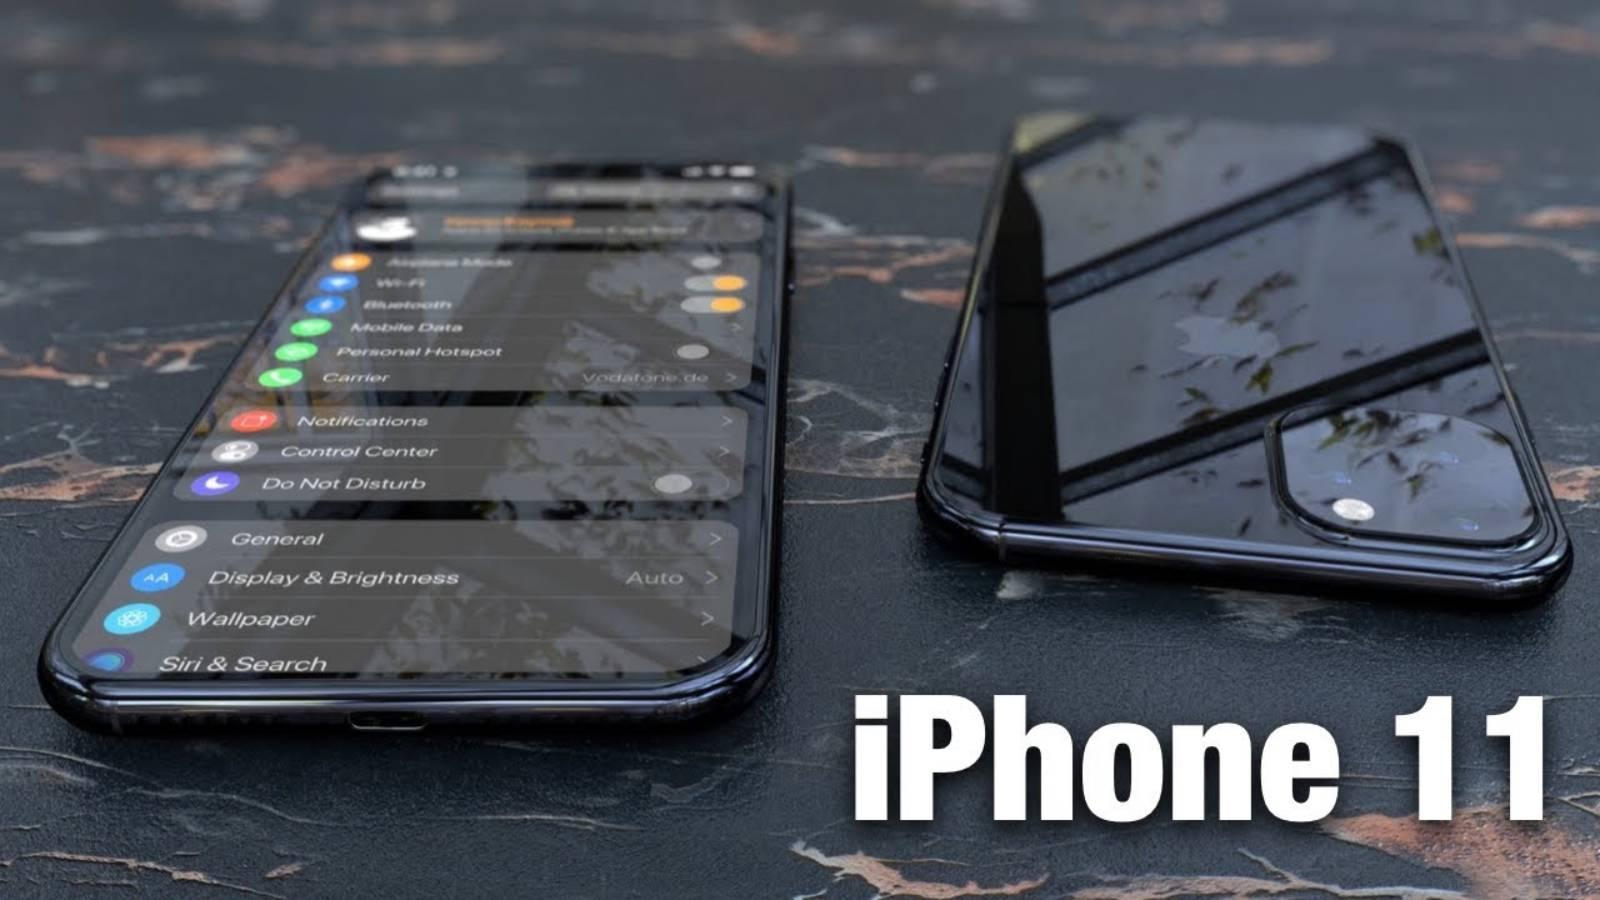 iPhone 11 antene